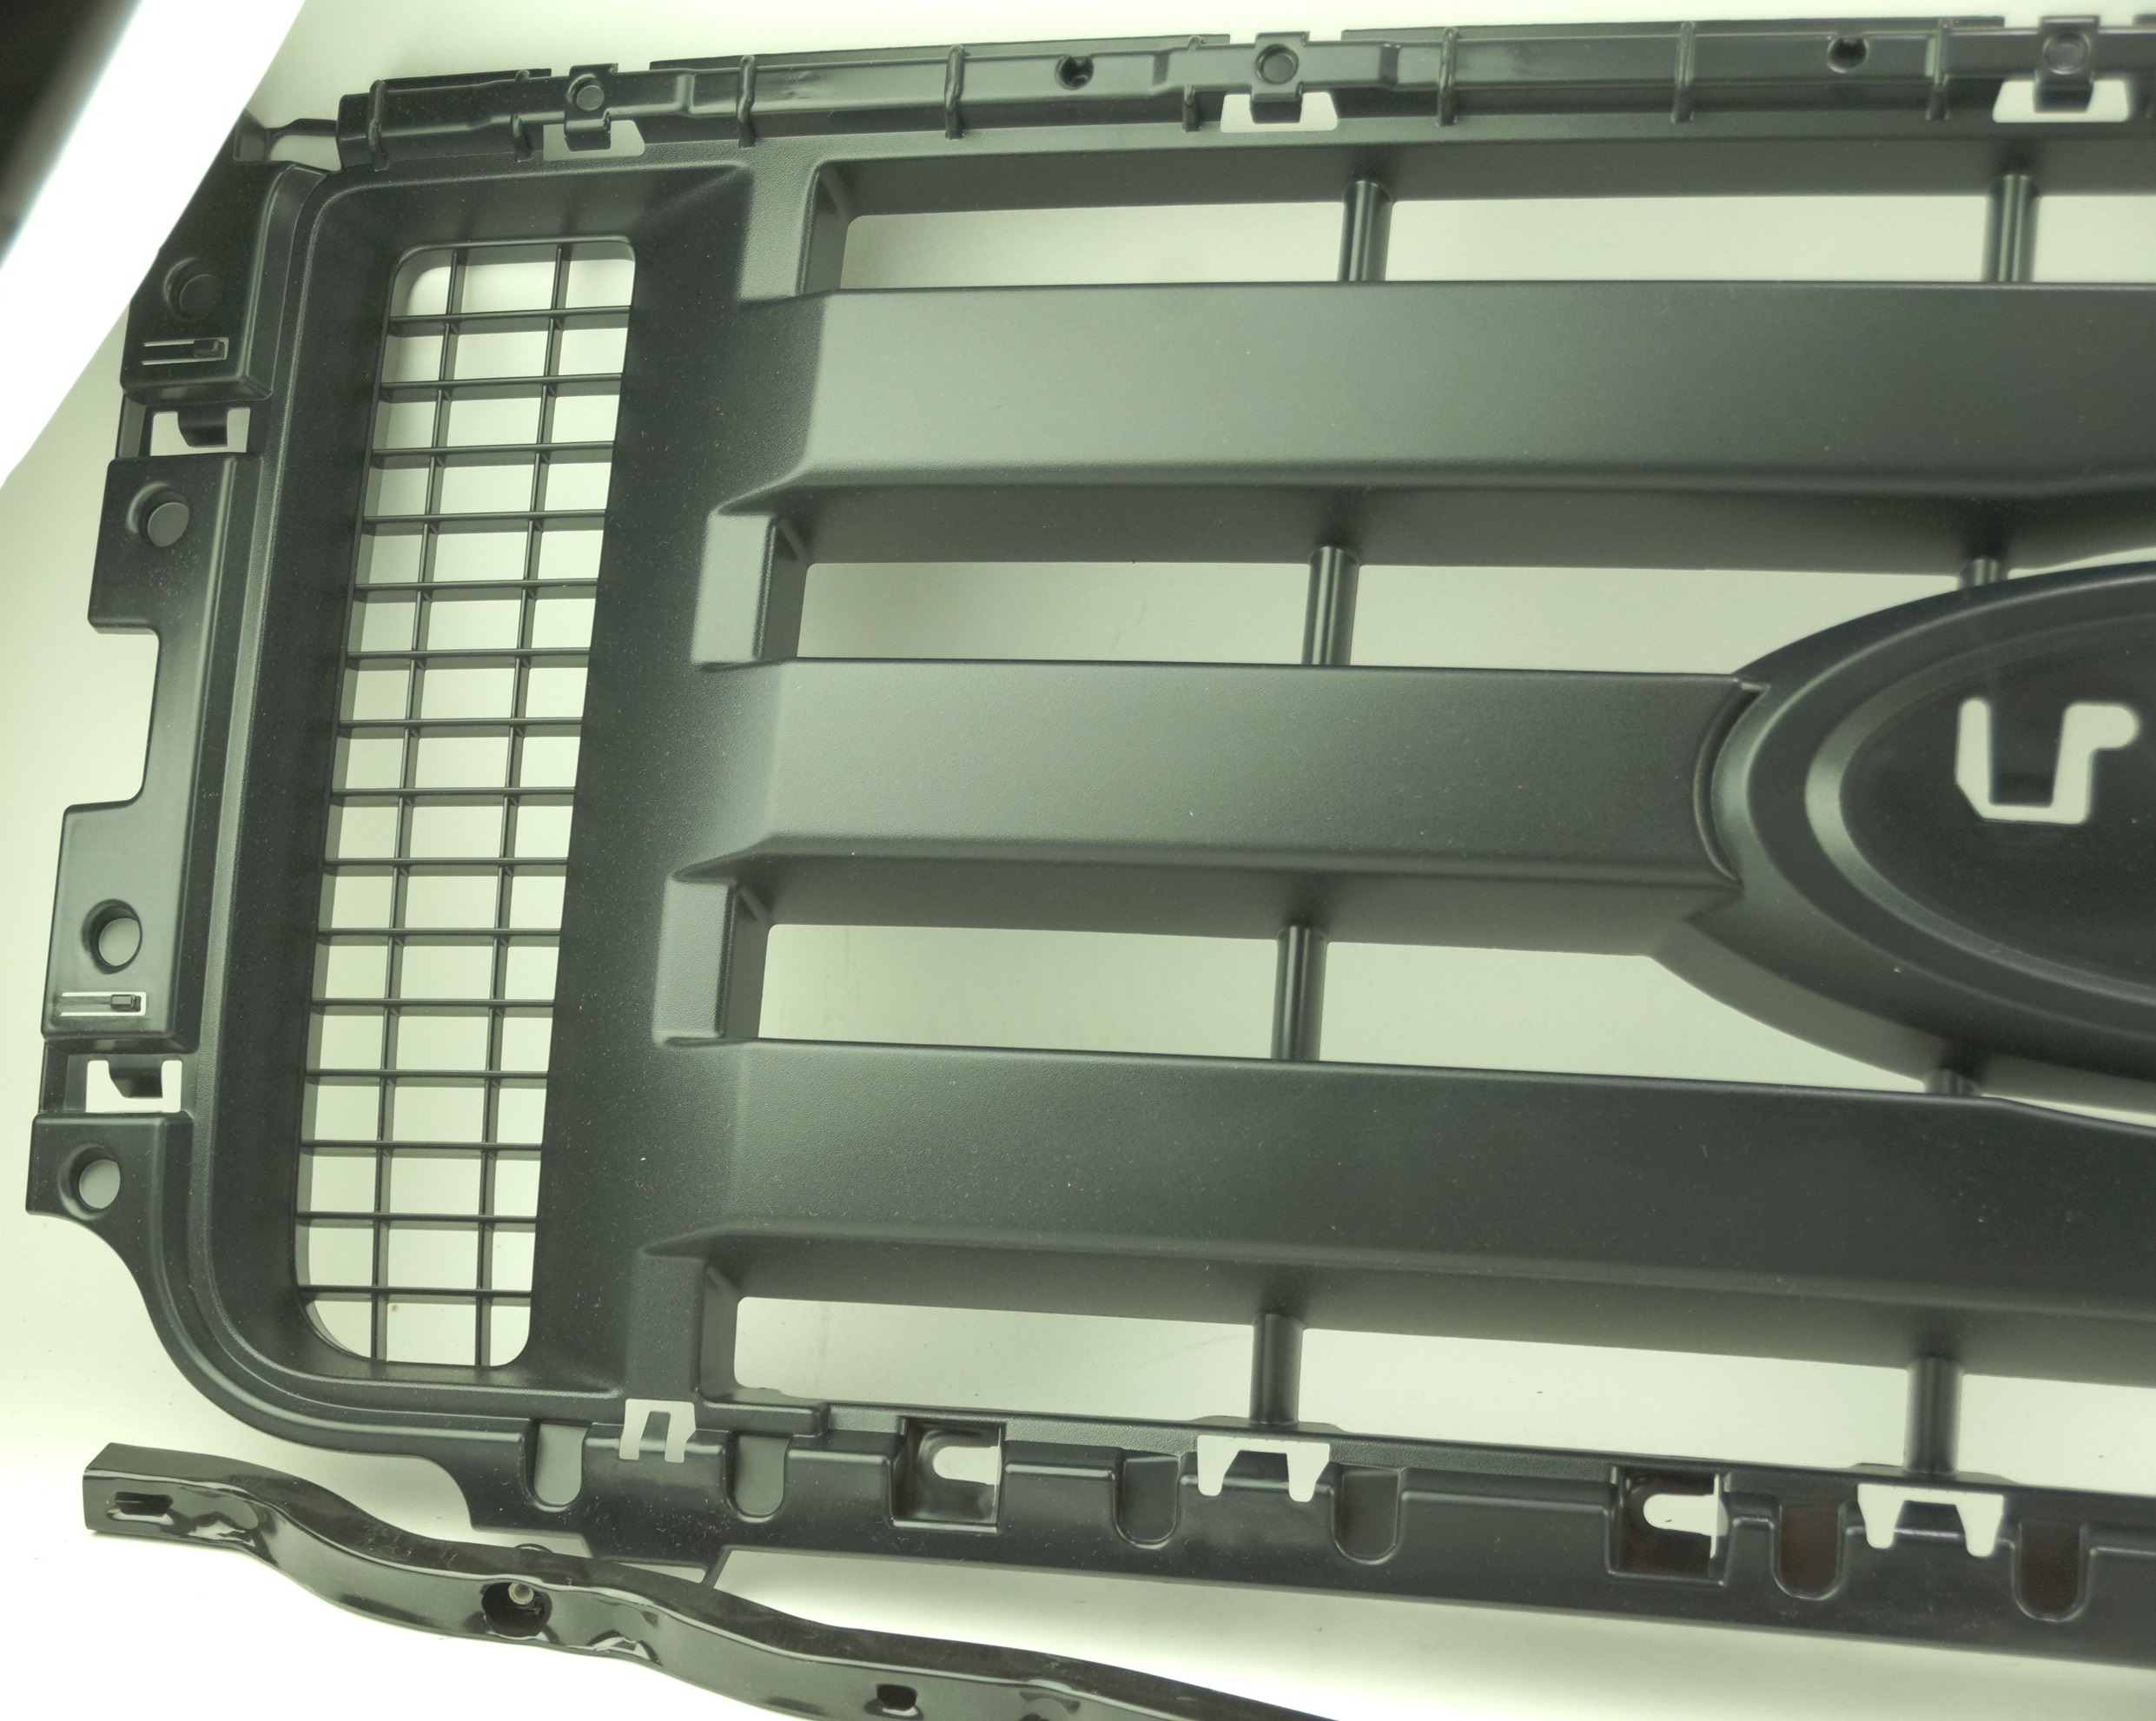 New OEM 9L3Z8200BPTM Ford 09-14 F-150 Grille Insert Gray Shell Textured Black - image 2